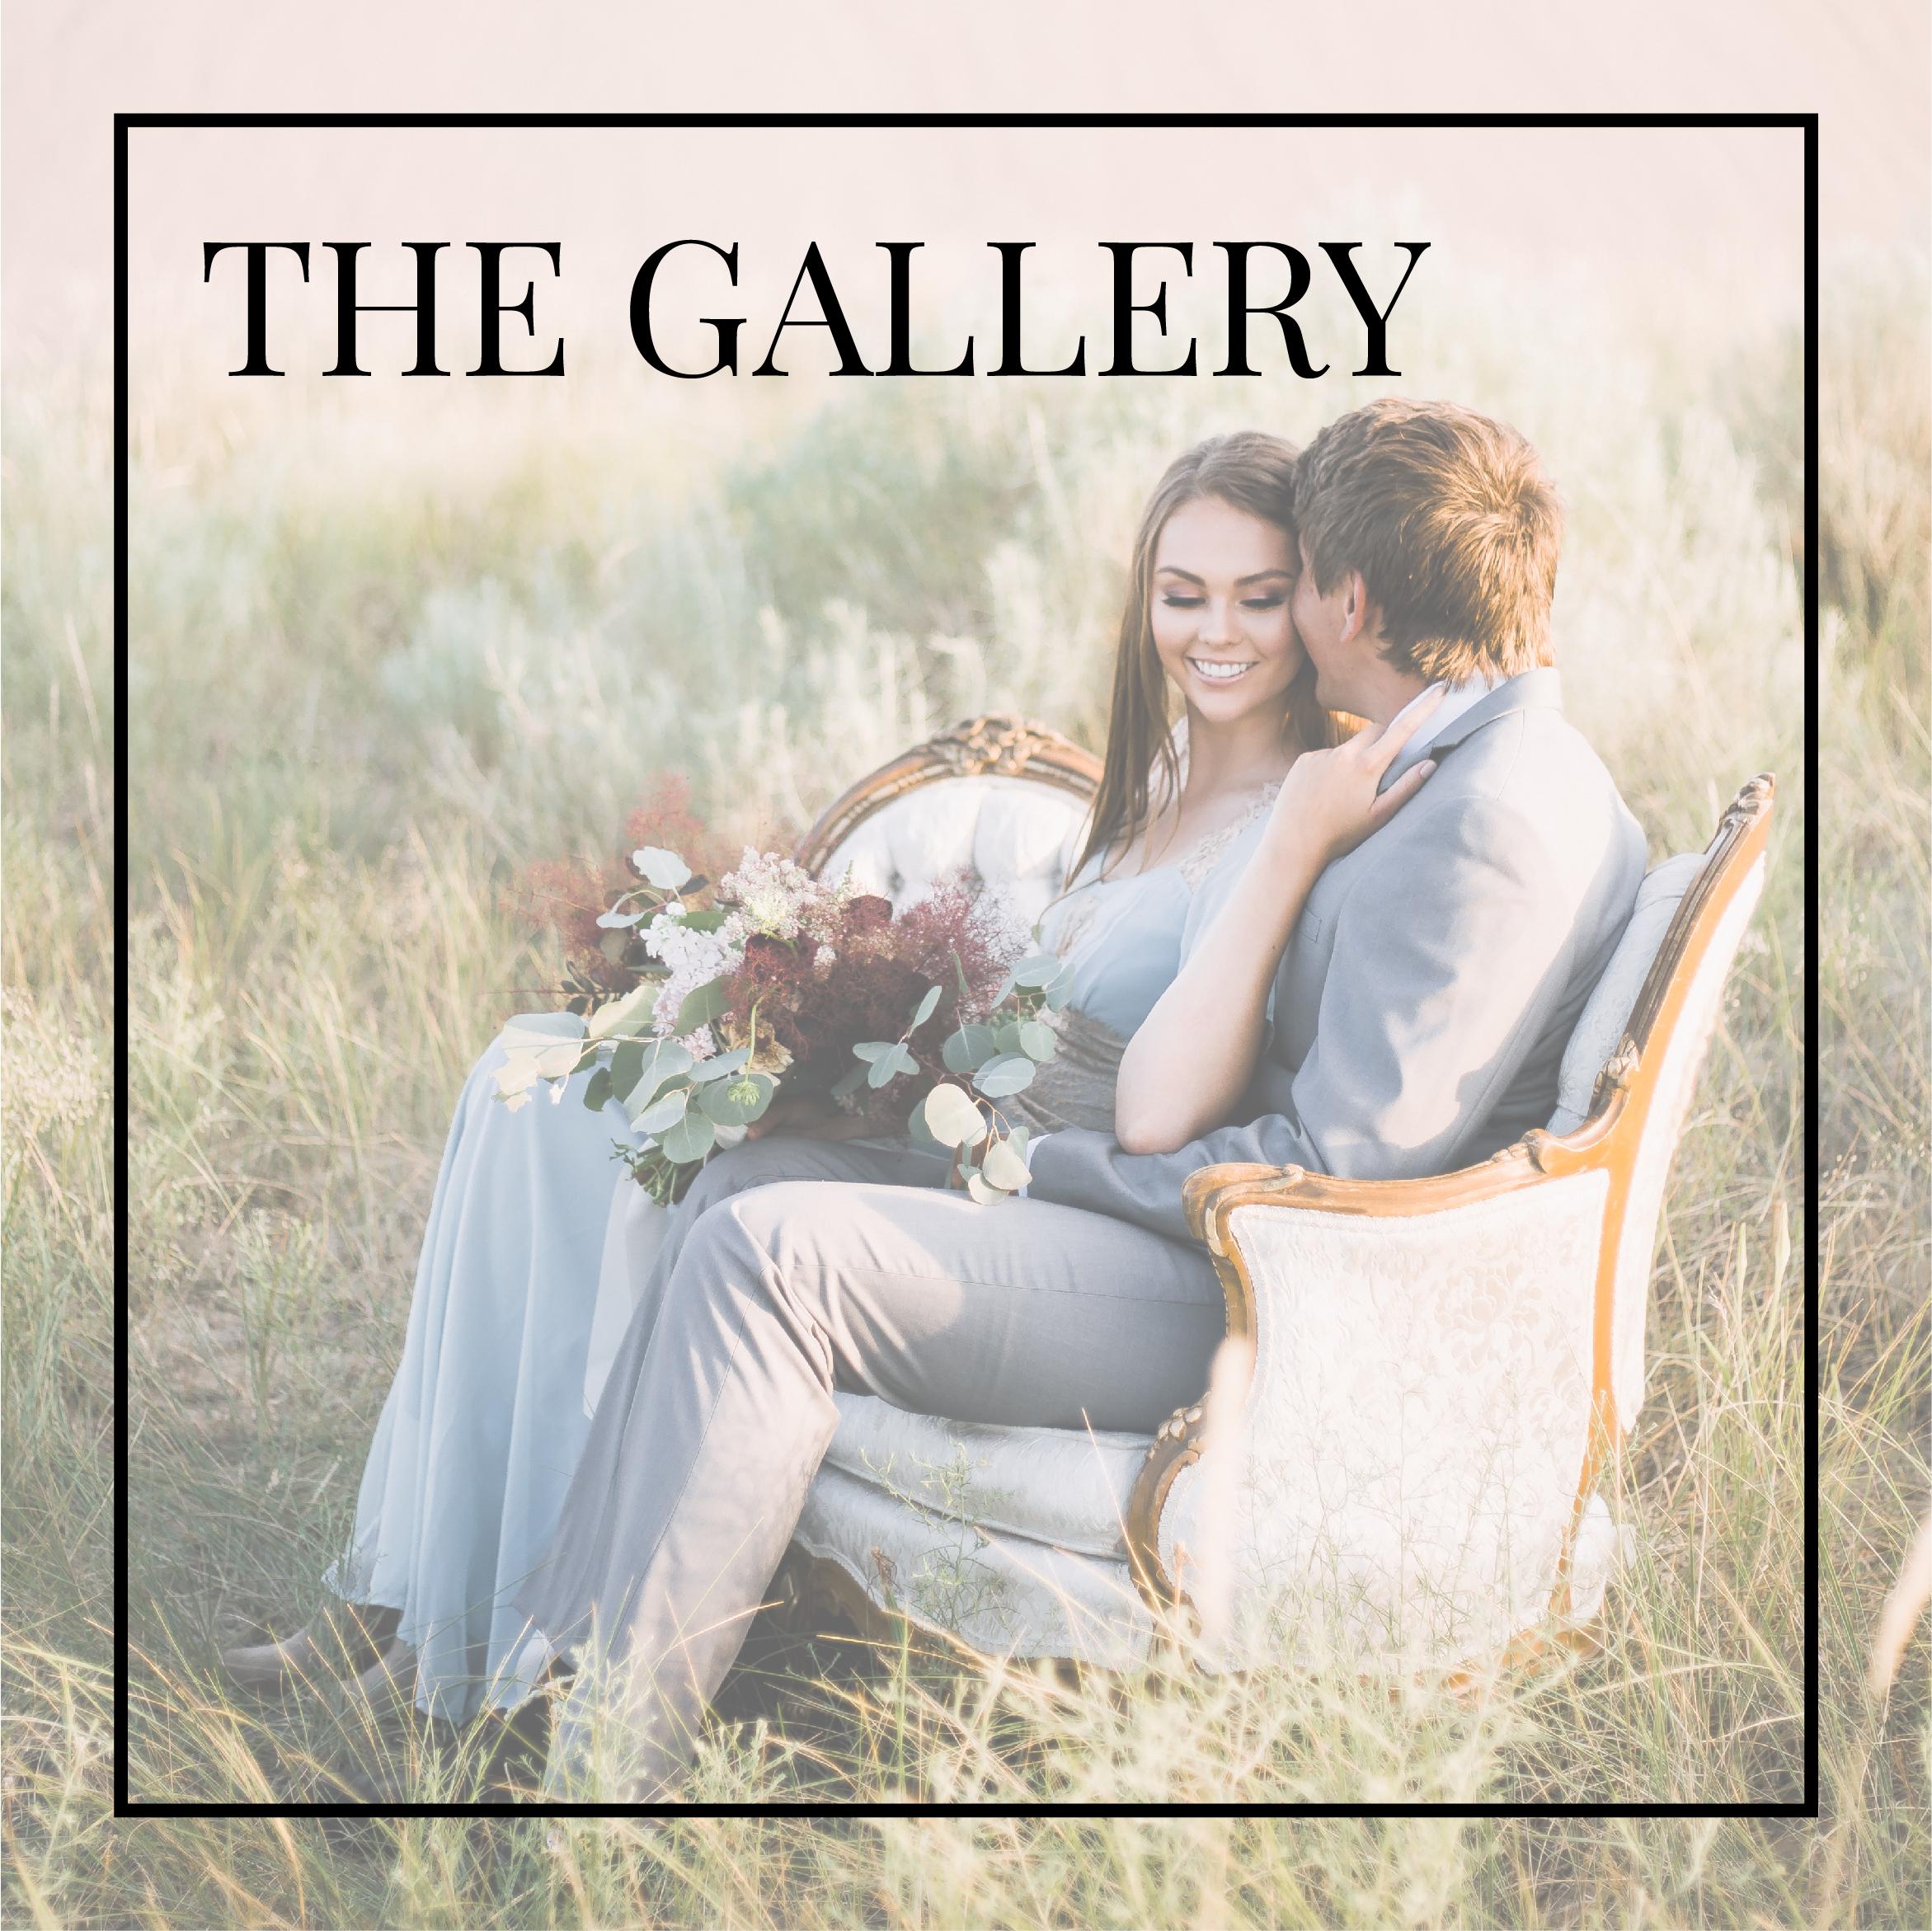 The Gallery-04.jpg